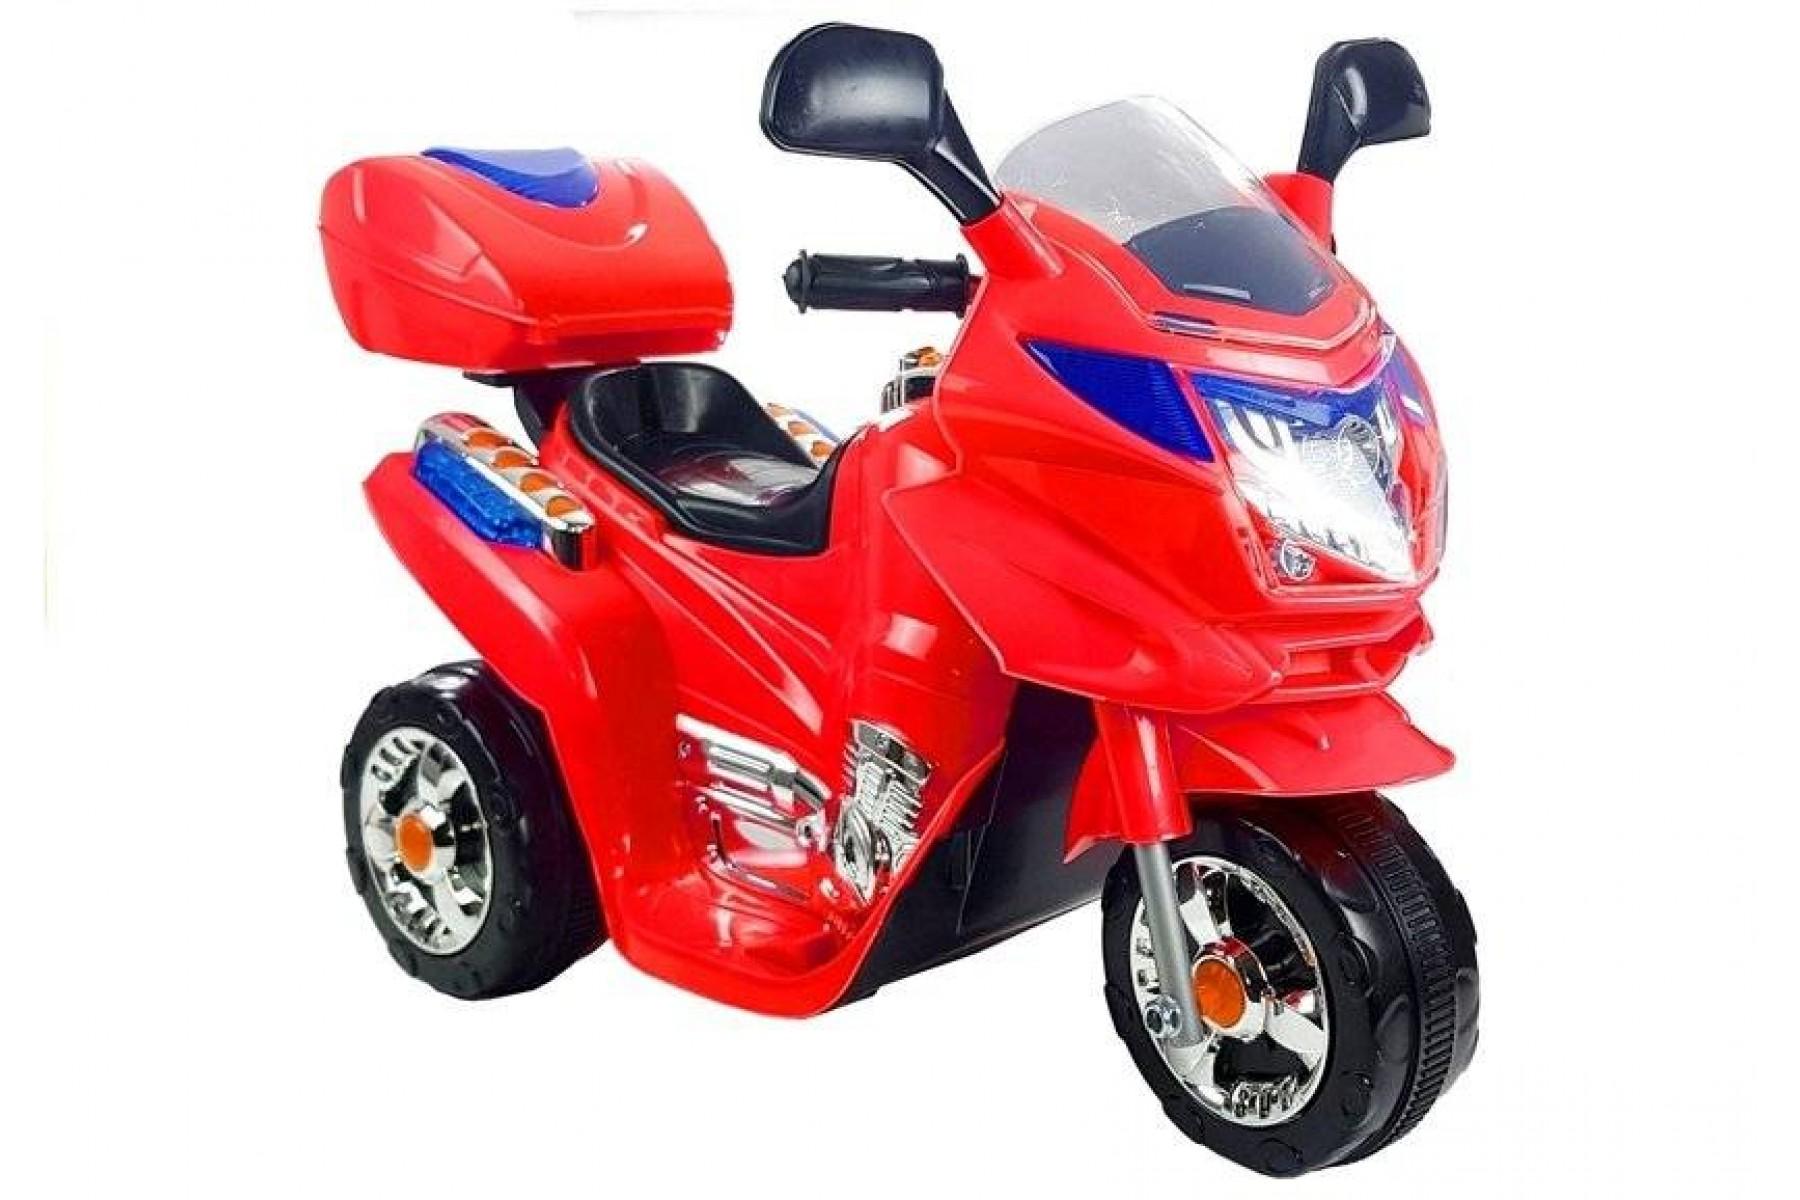 OTROŠKI MOTOR NA AKUMULATOR HC8051 (rdeč)